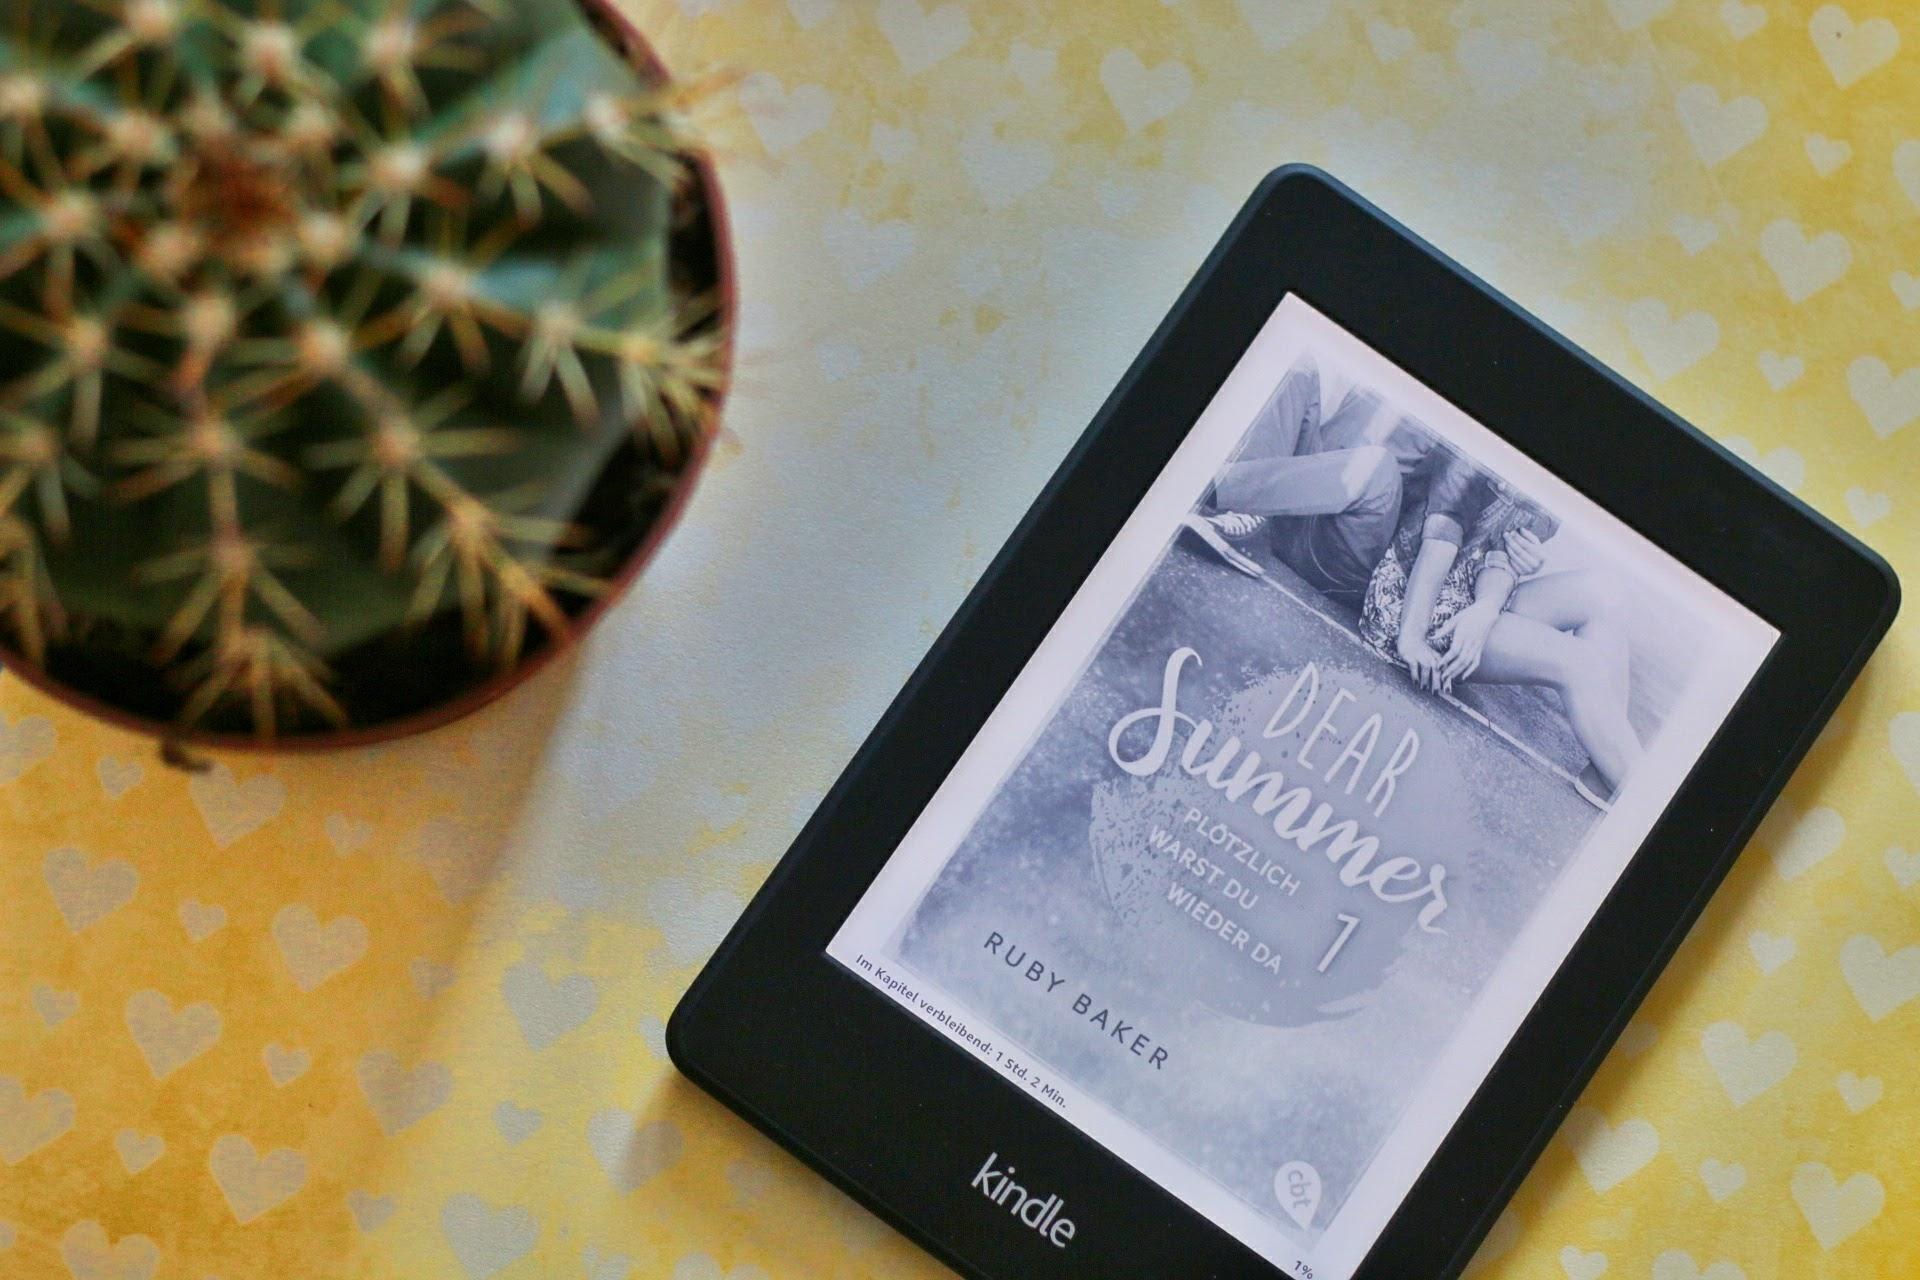 Dear Summer 1 Plötzlich warst du wieder da Ruby Baker Cover Kindle